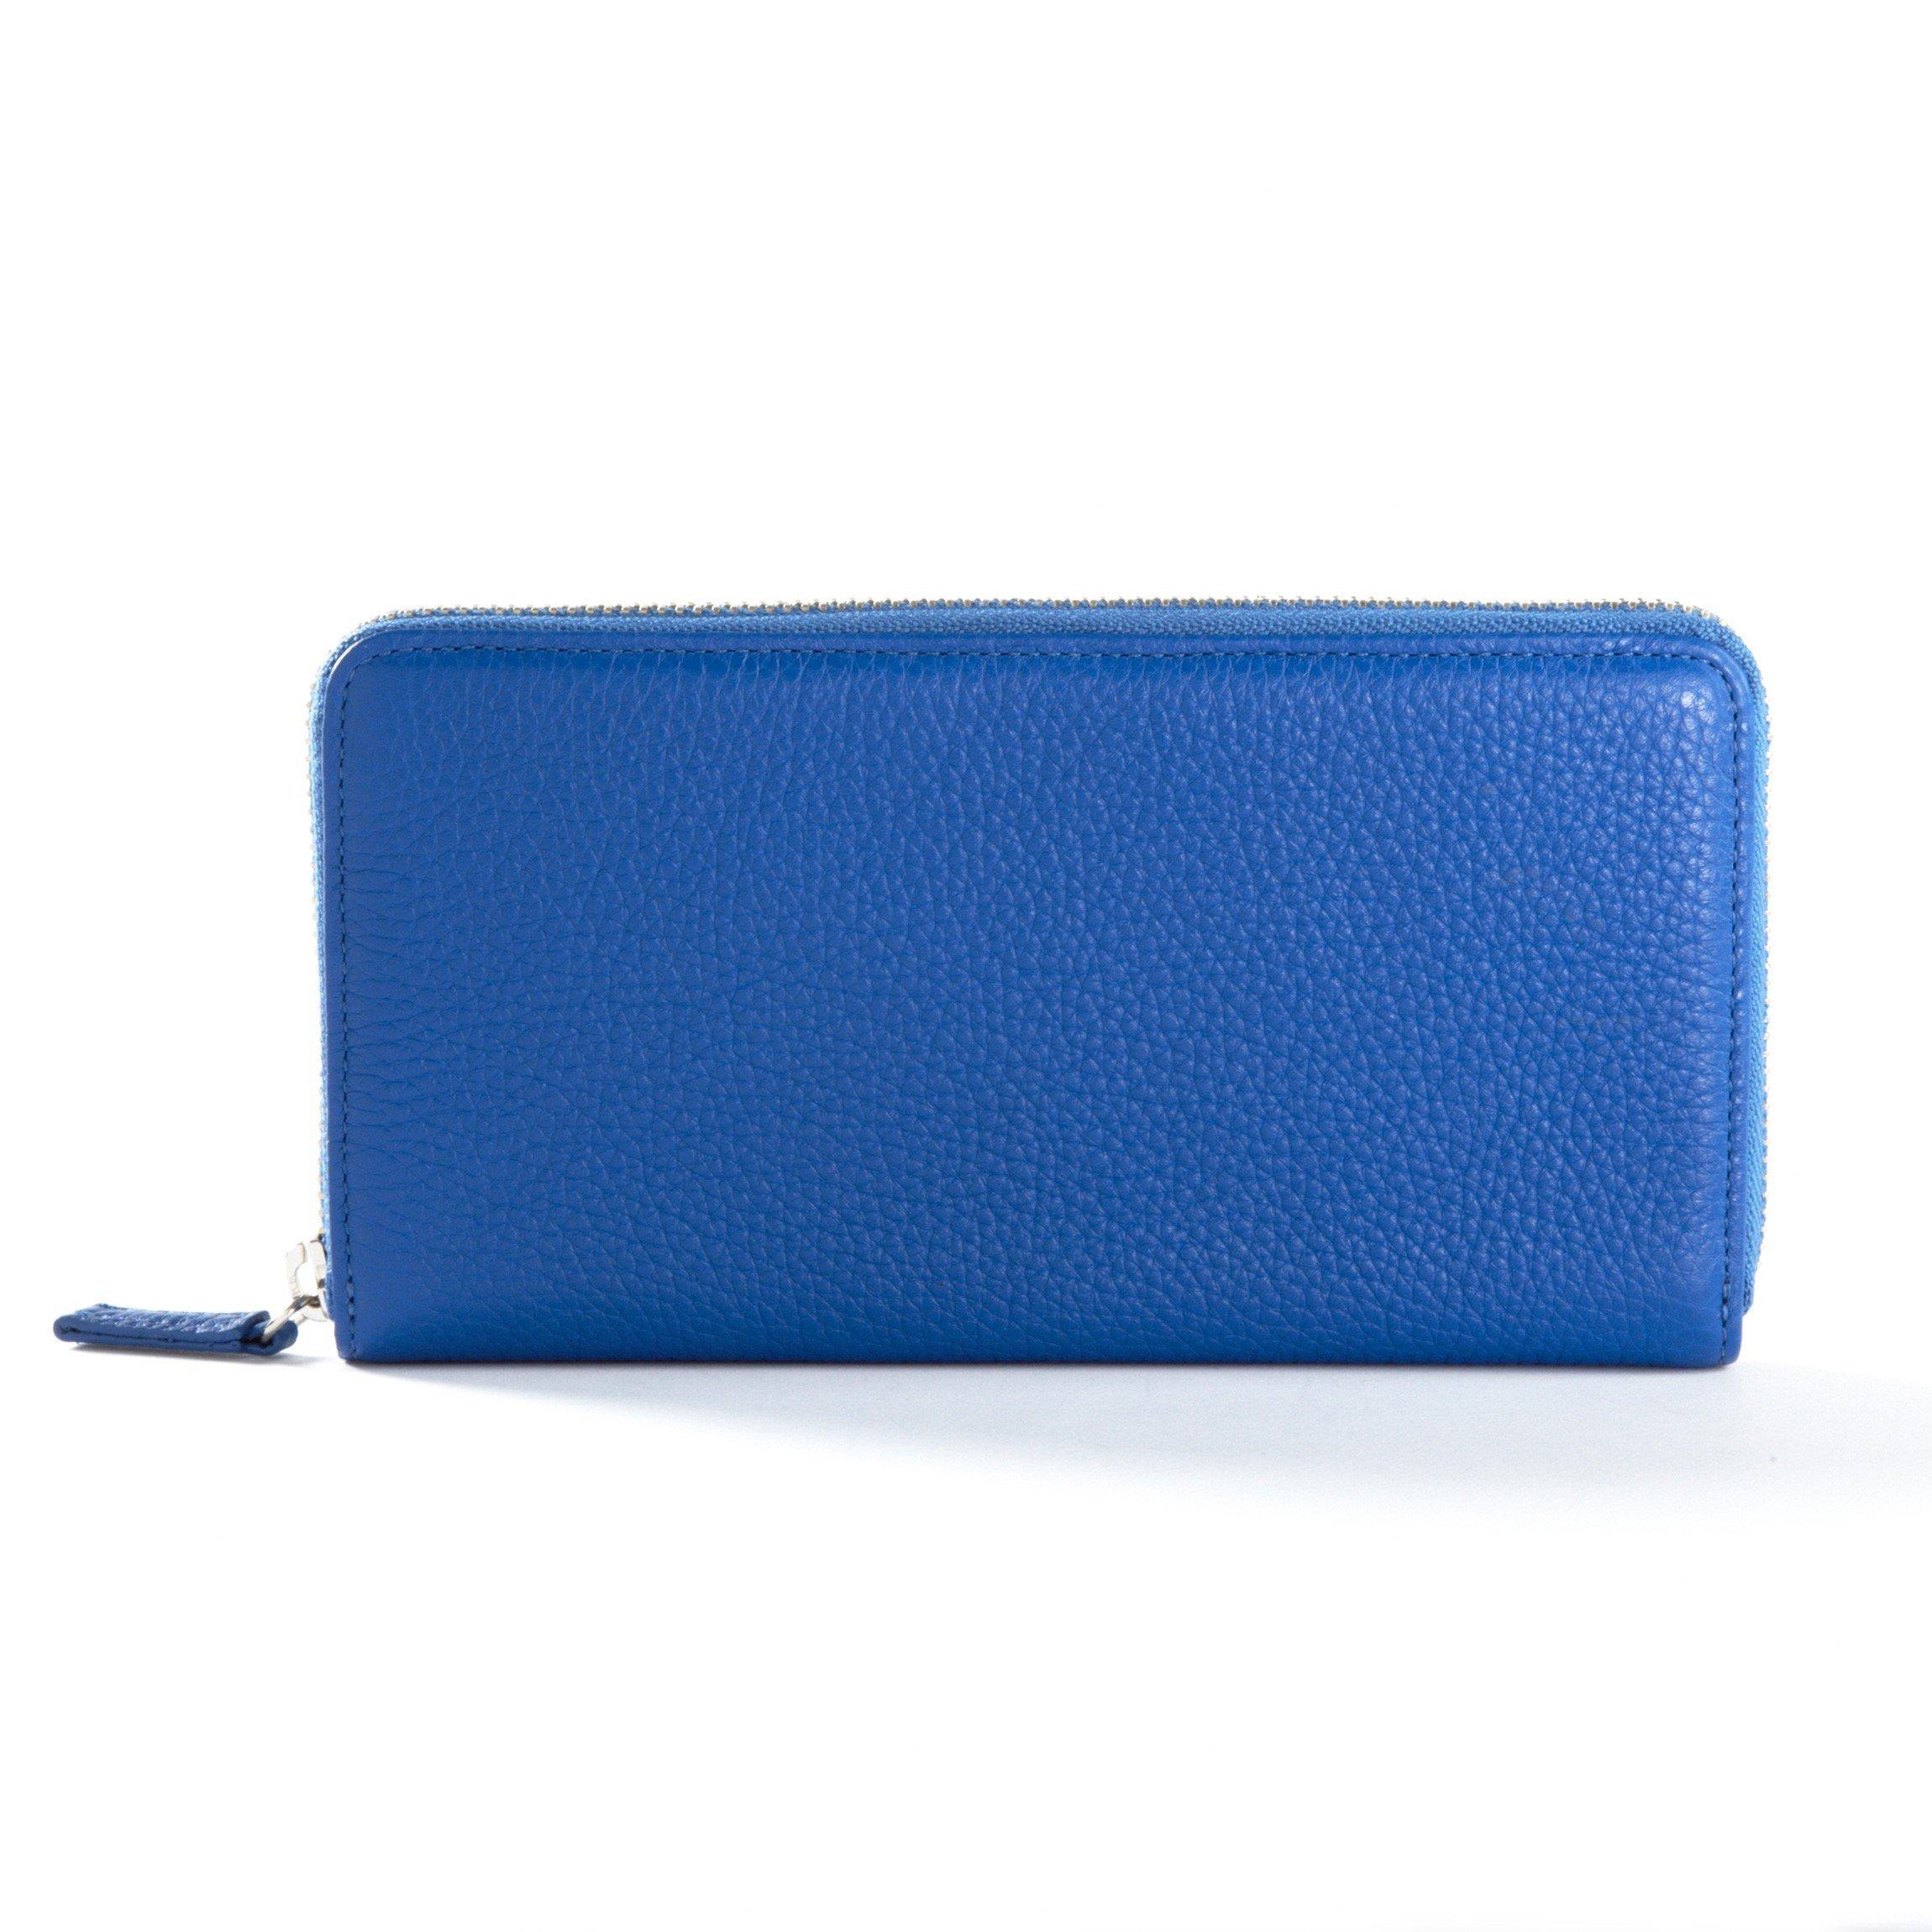 Zippered Continental Wallet - Full Grain Leather - Cobalt (blue)